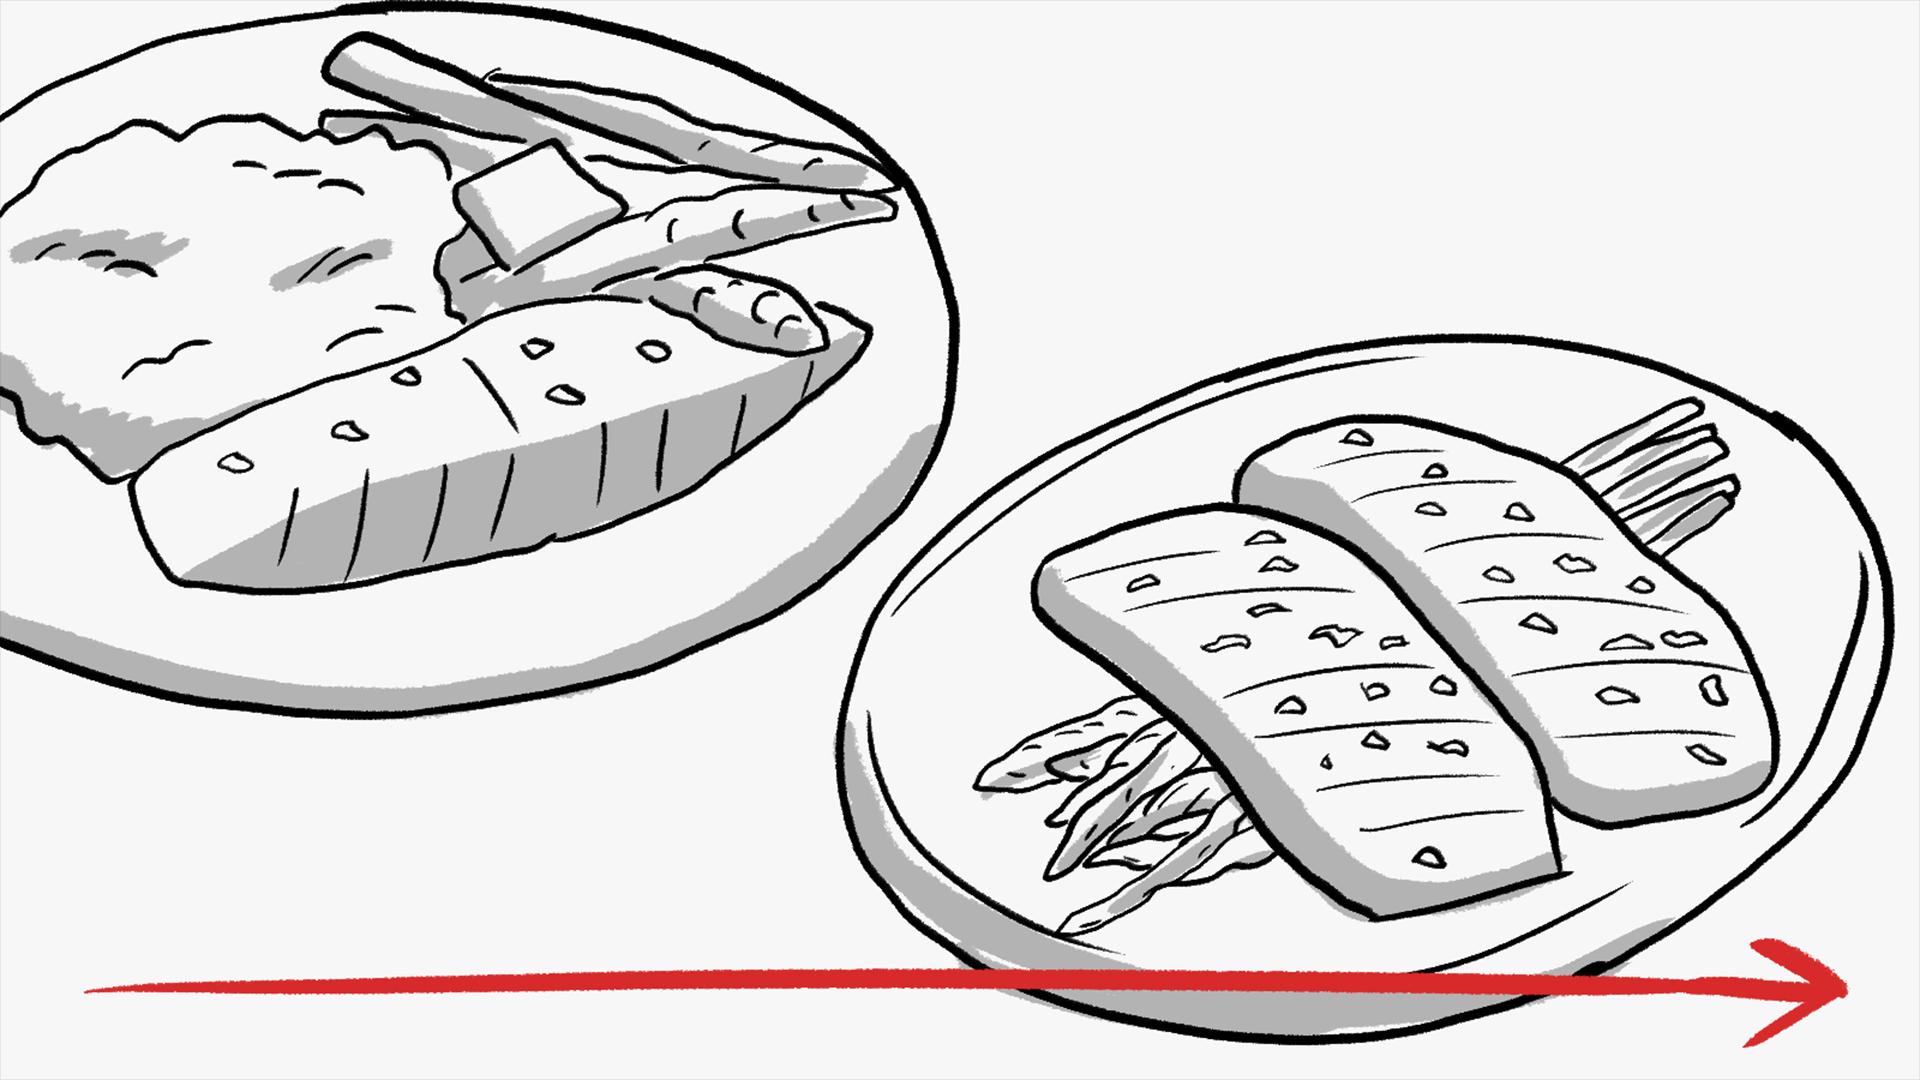 salmon-1-board-00001-Recovered0021.jpg